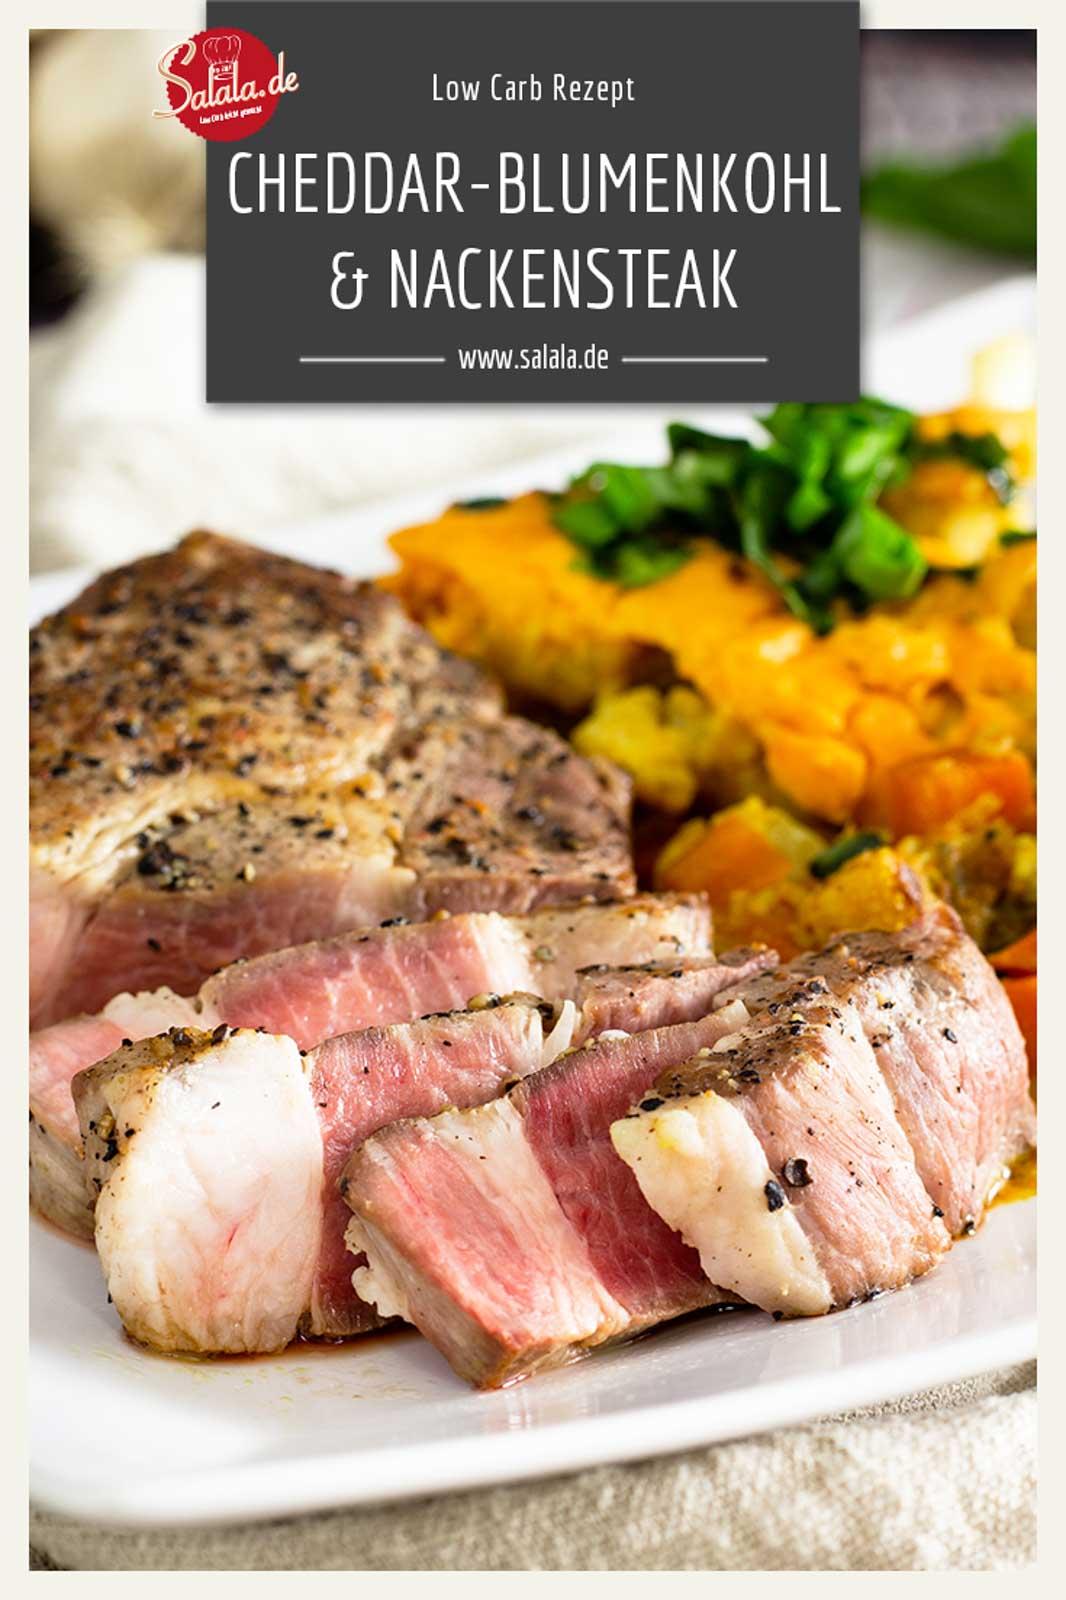 #Cook4Me #Blumenkohl #Nackensteak #LowCarb #Rezepte #LowCarbRezept